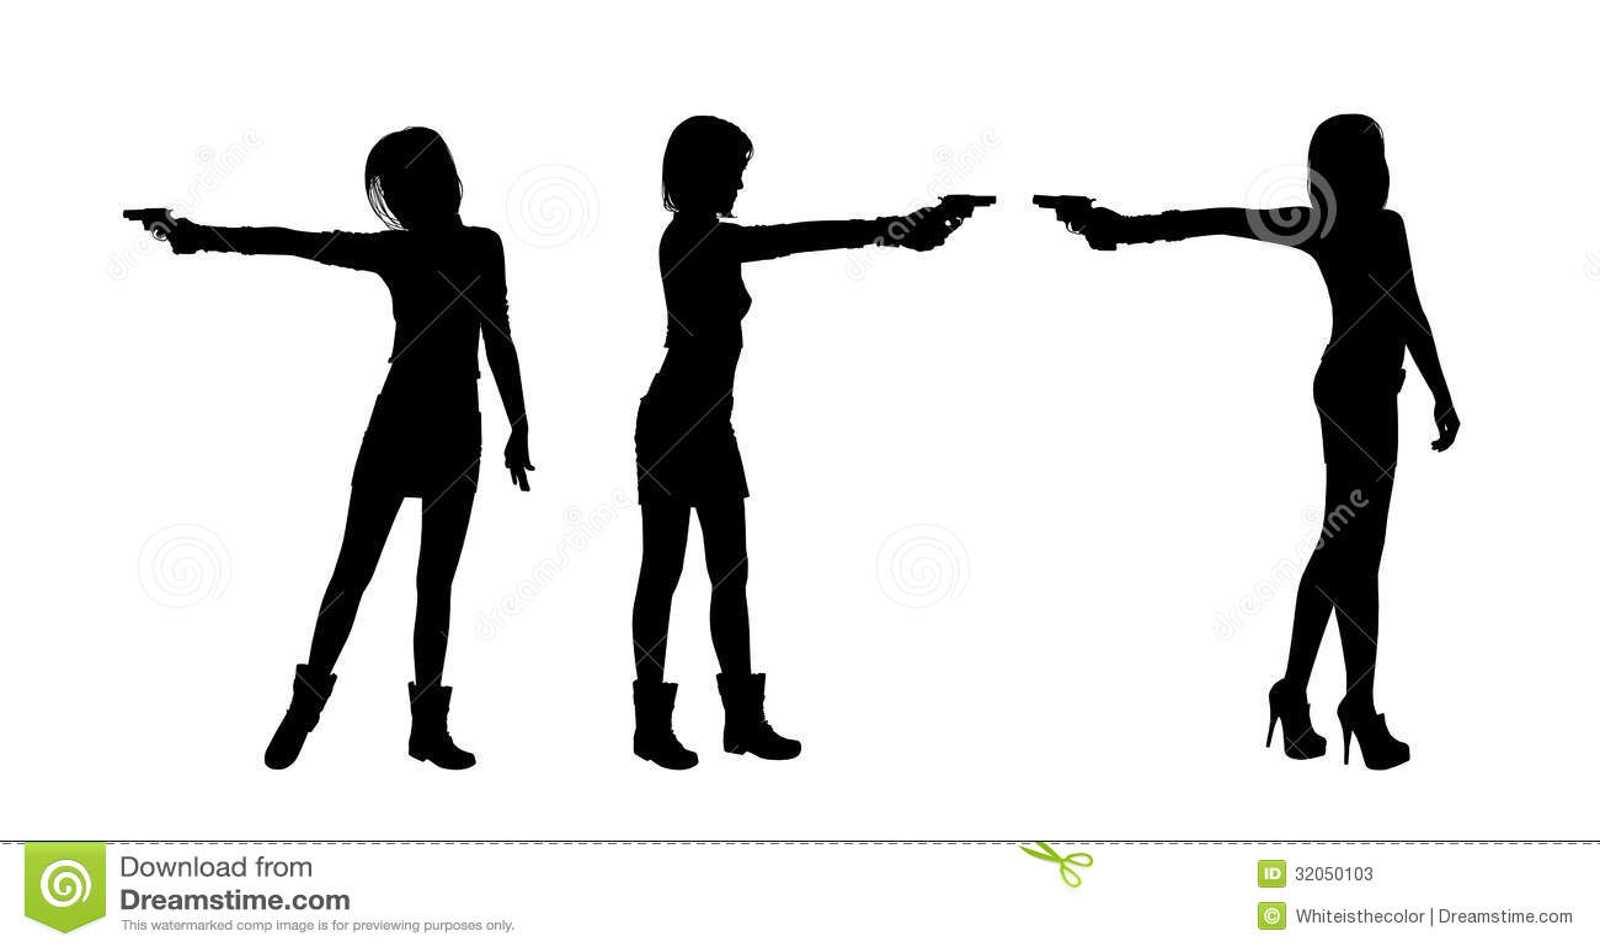 Women Shooting Guns Images, Stock Photos & Vectors ...